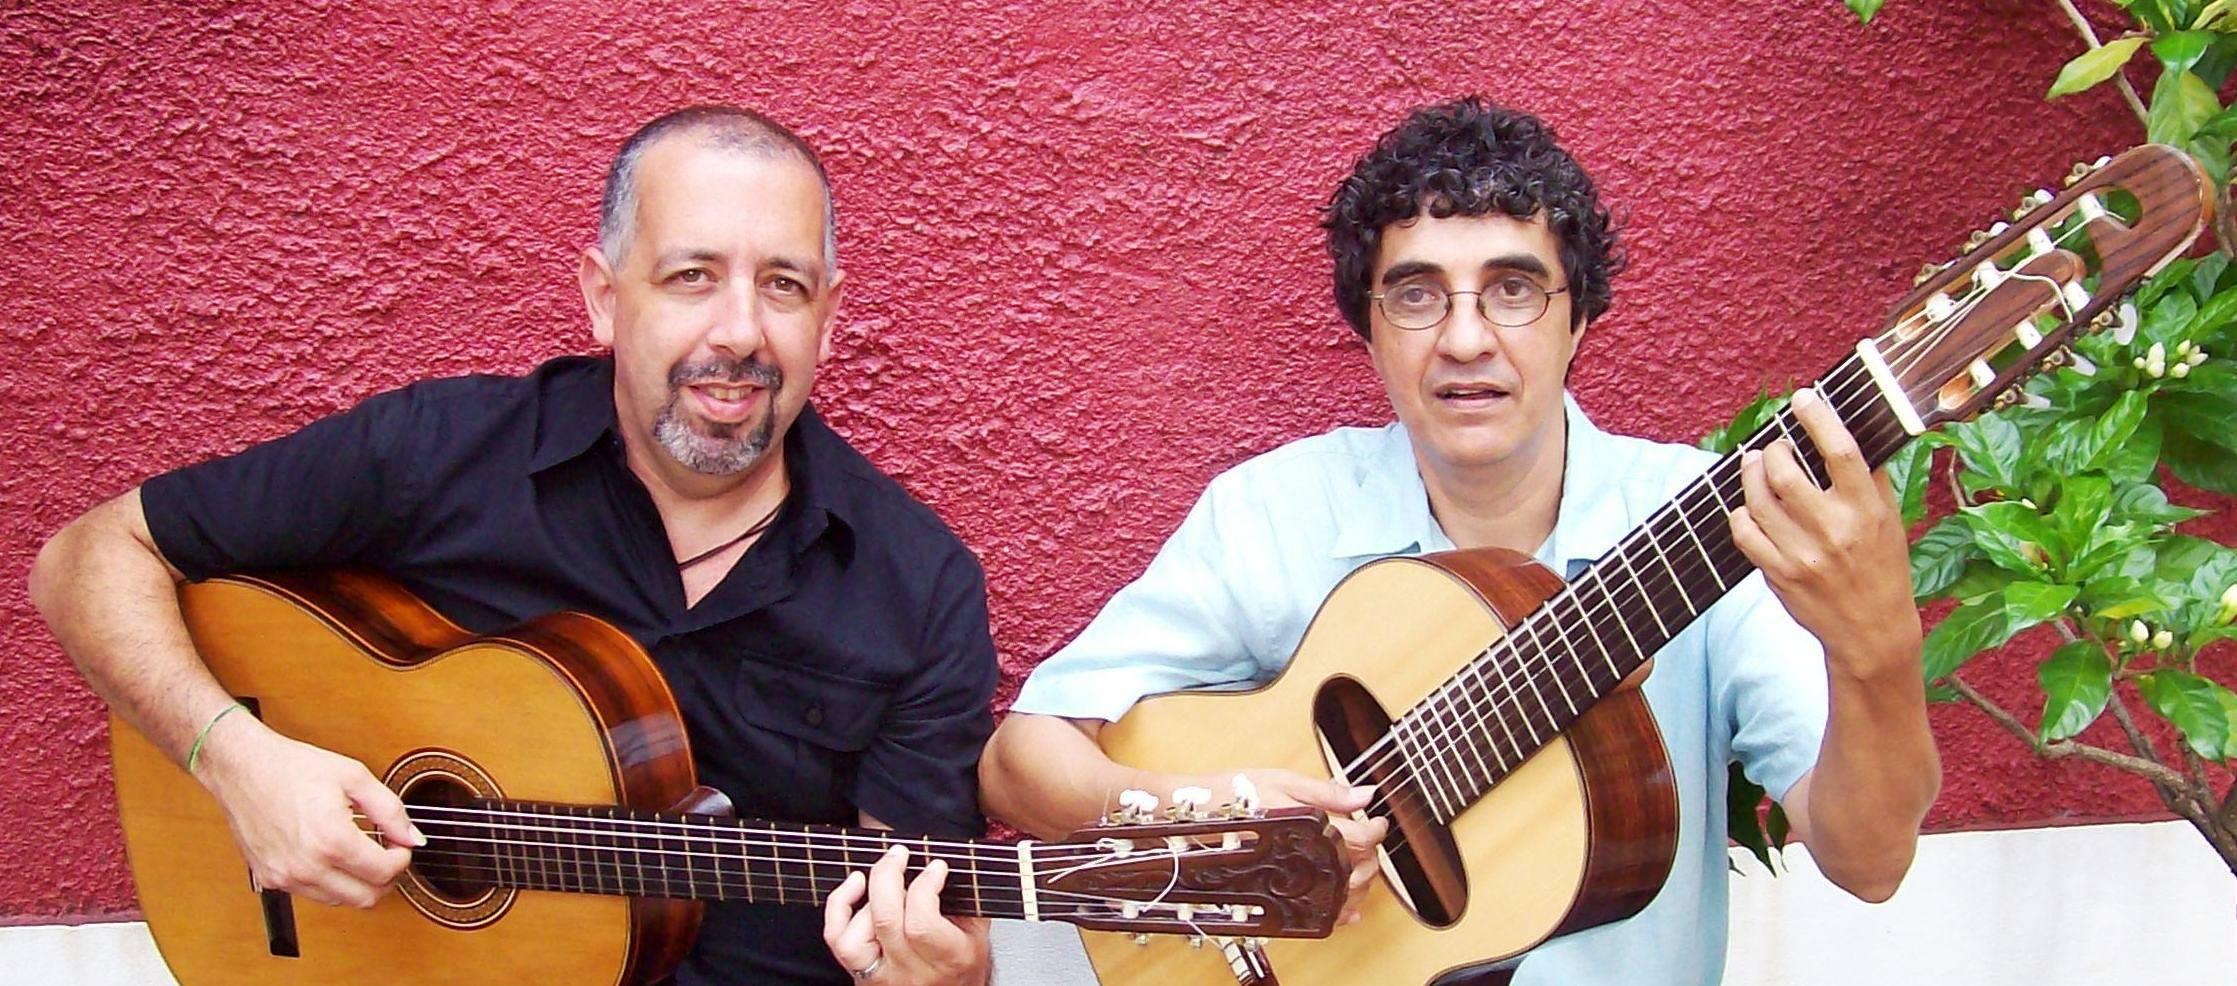 ROGÉRIO SOUZA & MARCELO FORTUNA